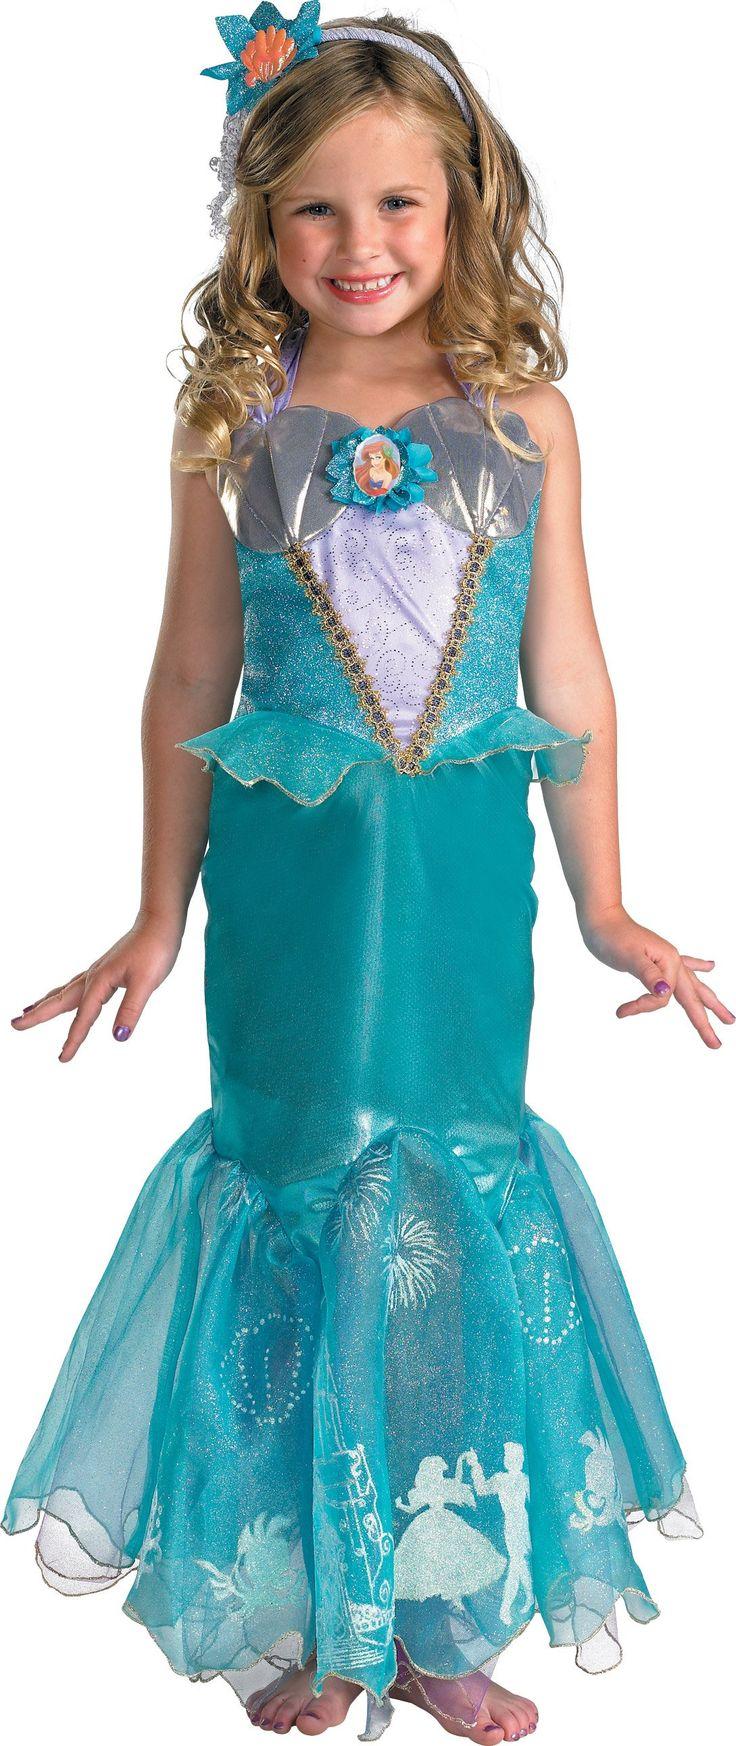 #Halloween #Disney Costumes Disney Characters  http://www.planetgoldilocks.com/halloween/disneycostumes.html